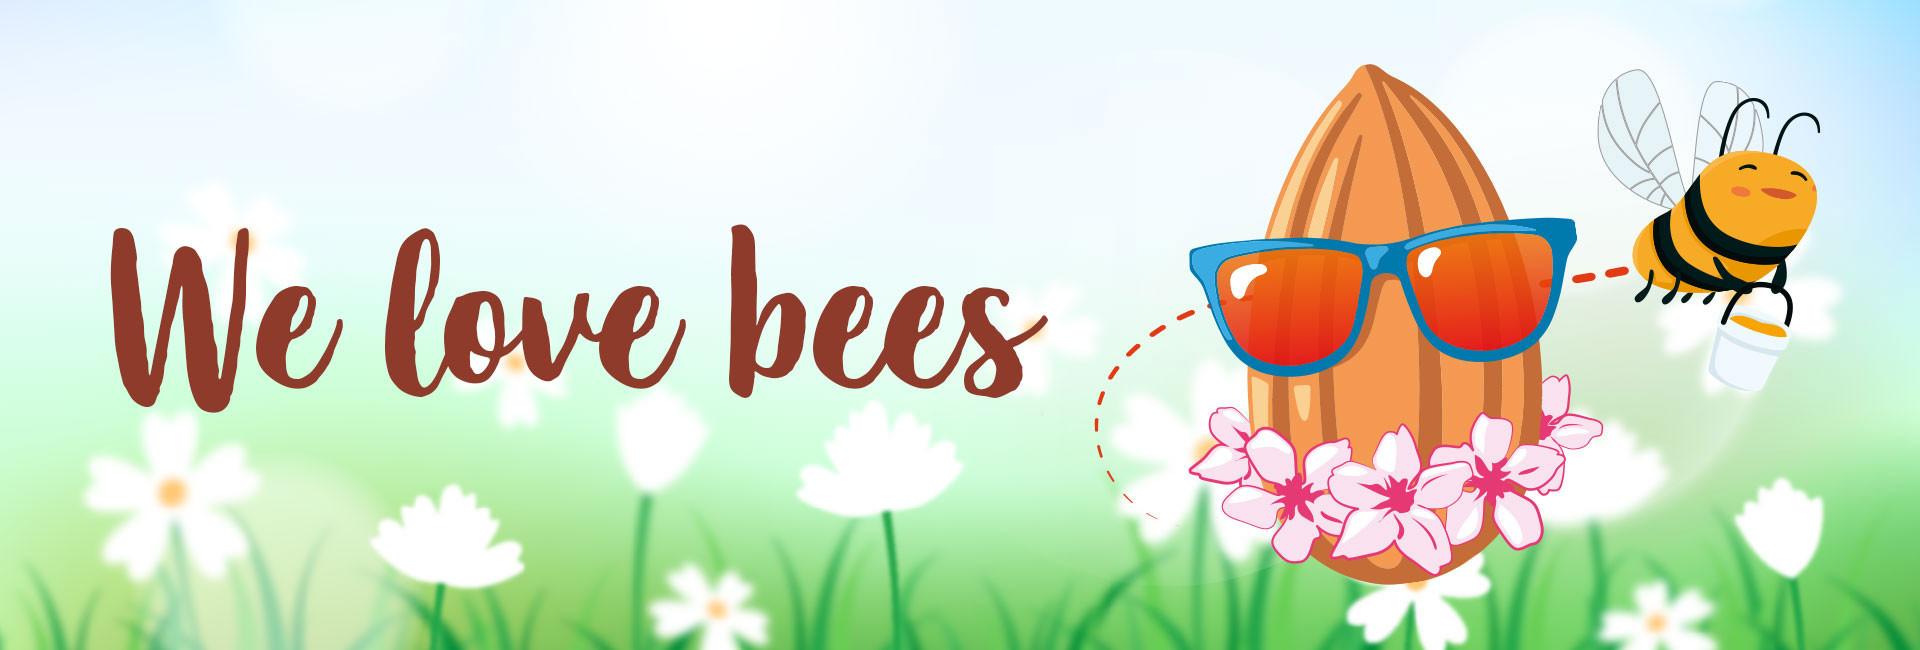 banner-bee-GB.2.jpg